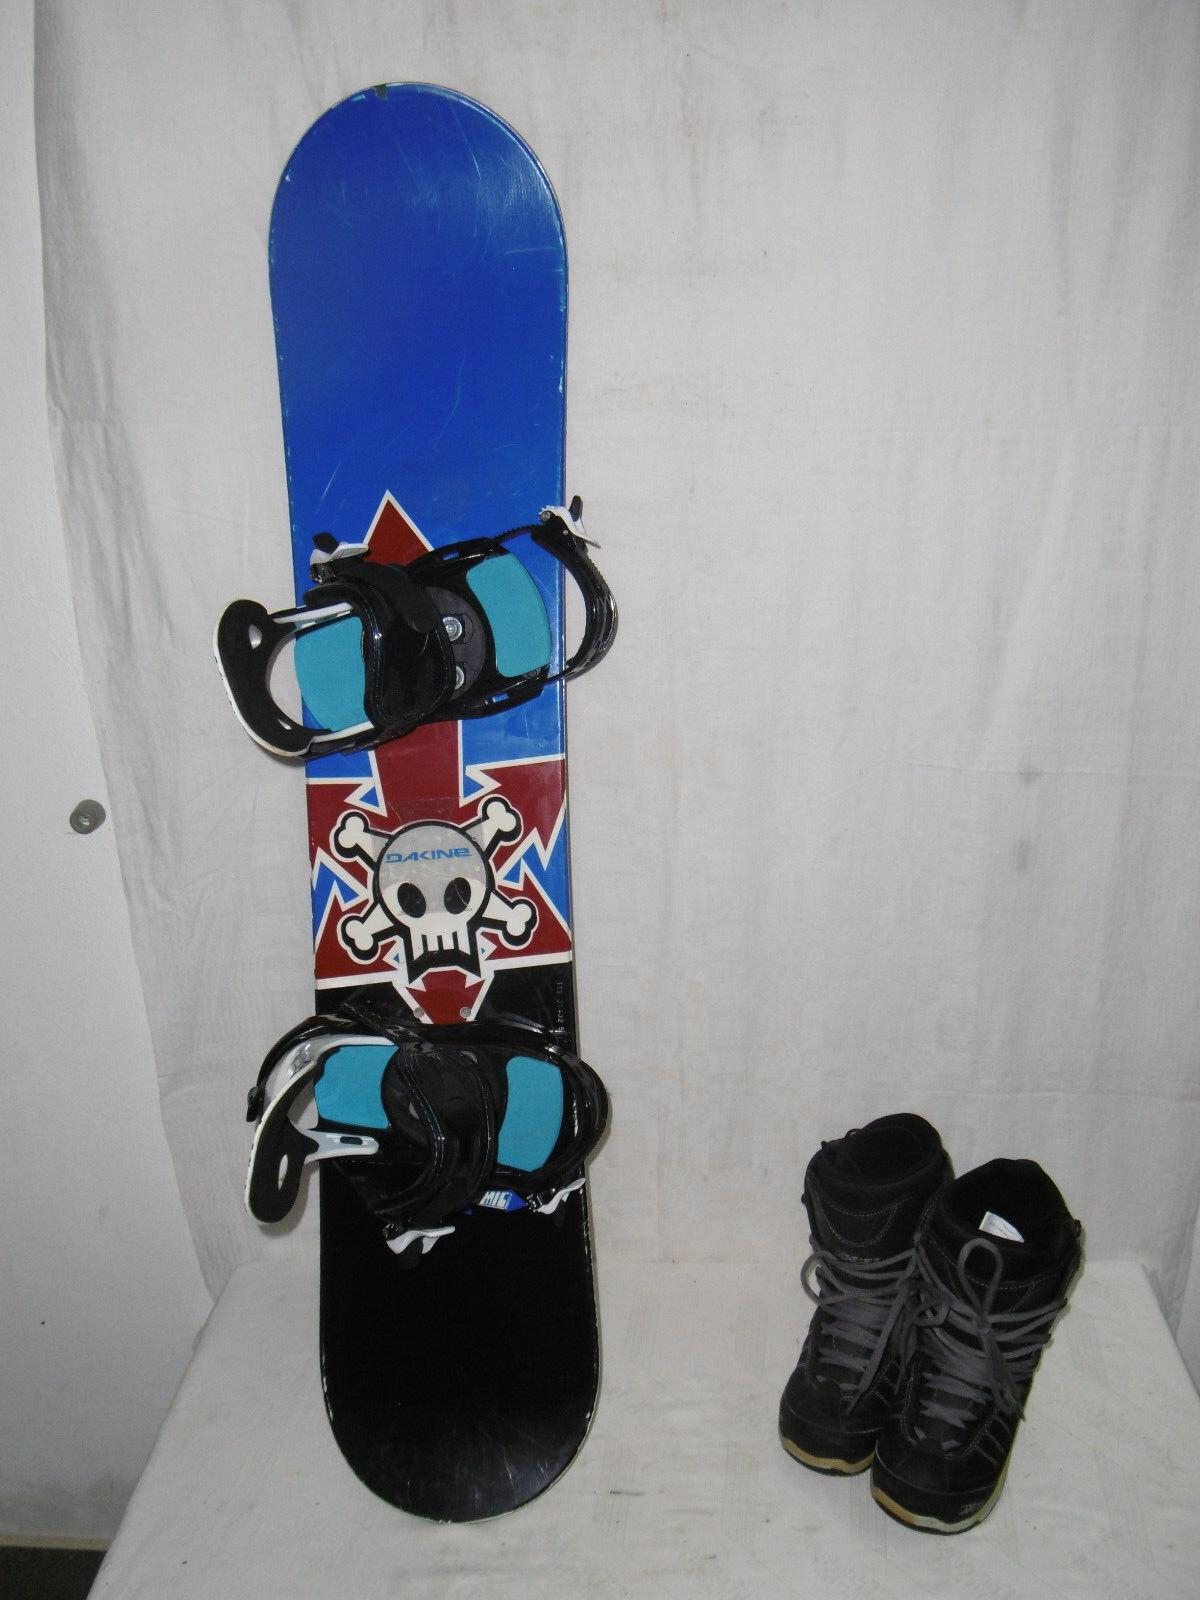 ATOMIC   SKULL   TOP JUNIOR SNOWBOARD SNOWBOARD SNOWBOARD 119 CM + AXCES Stiefel GR.  32 IM SET 0e8a03